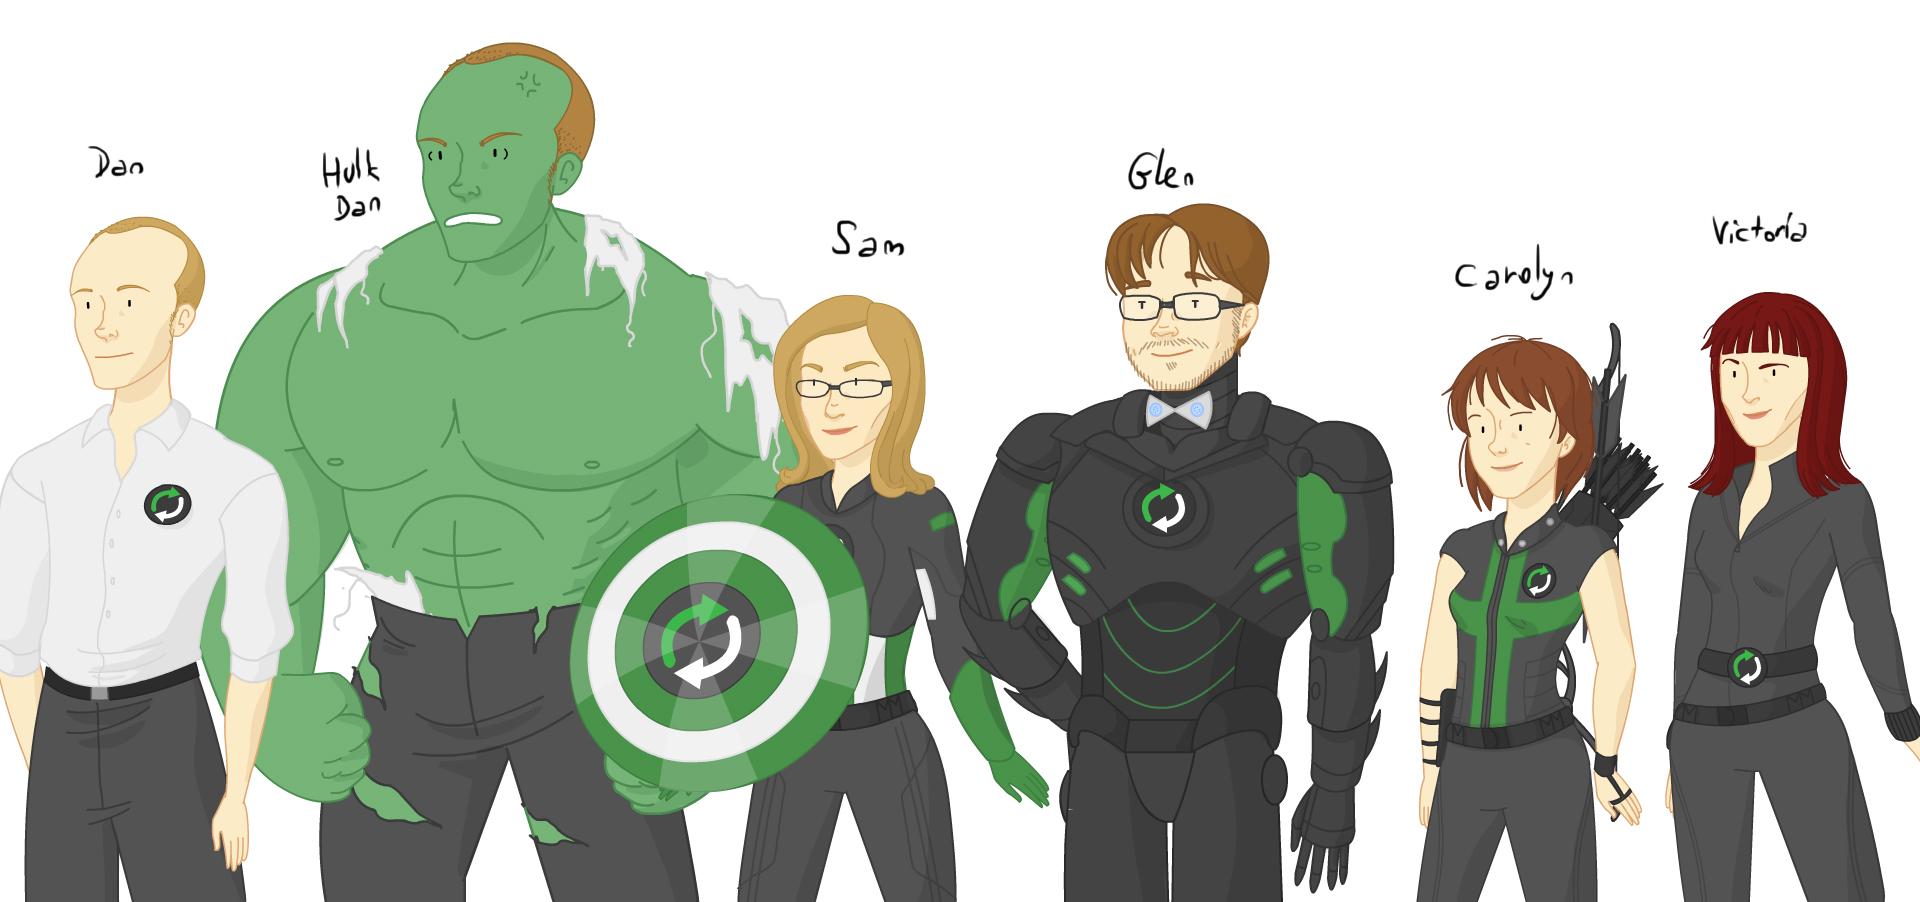 The Geekovengers (image credit Leigh Lahav)